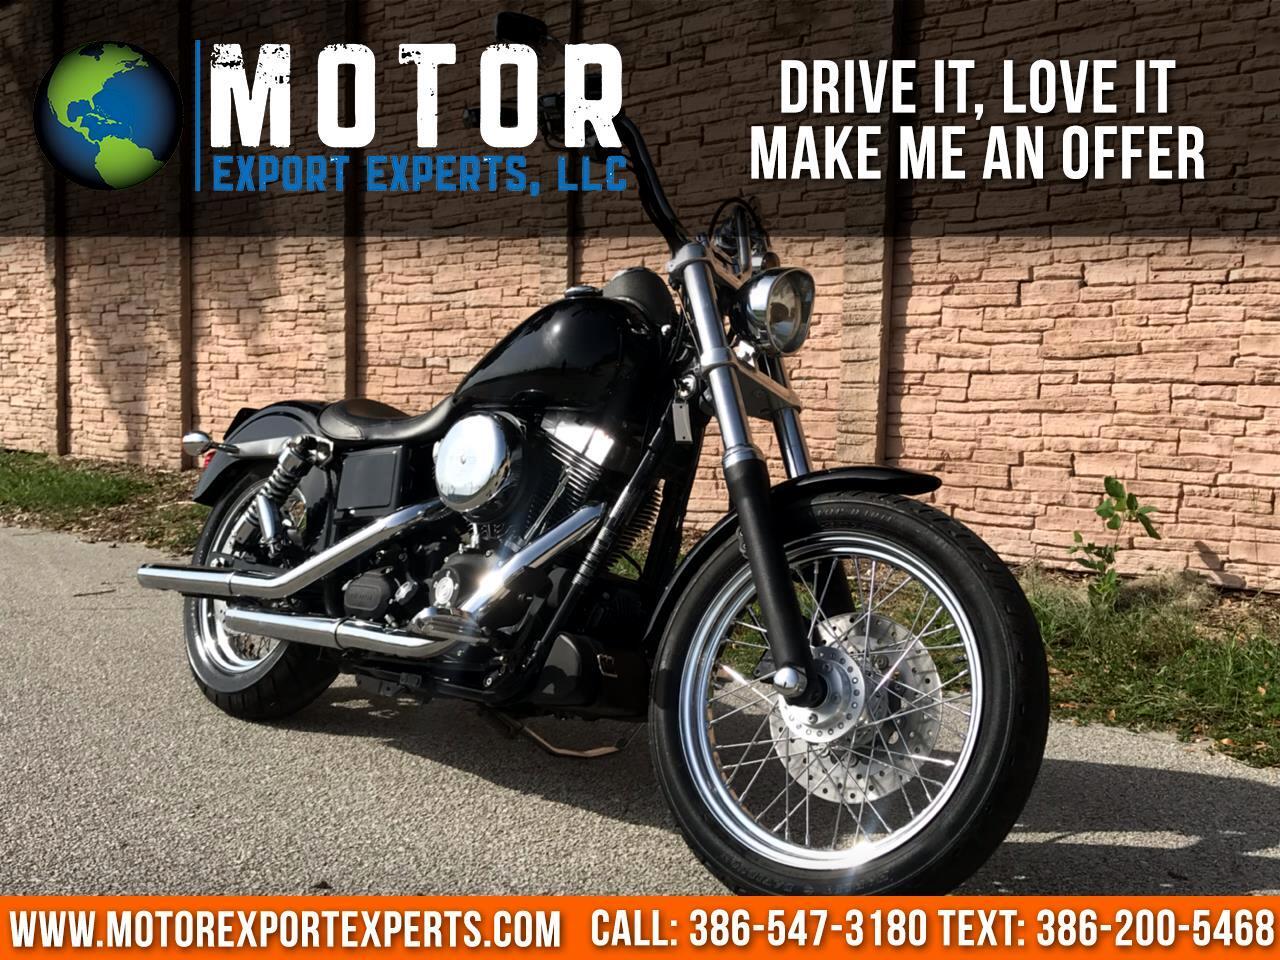 2007 Harley-Davidson FXDBI STREET BOB